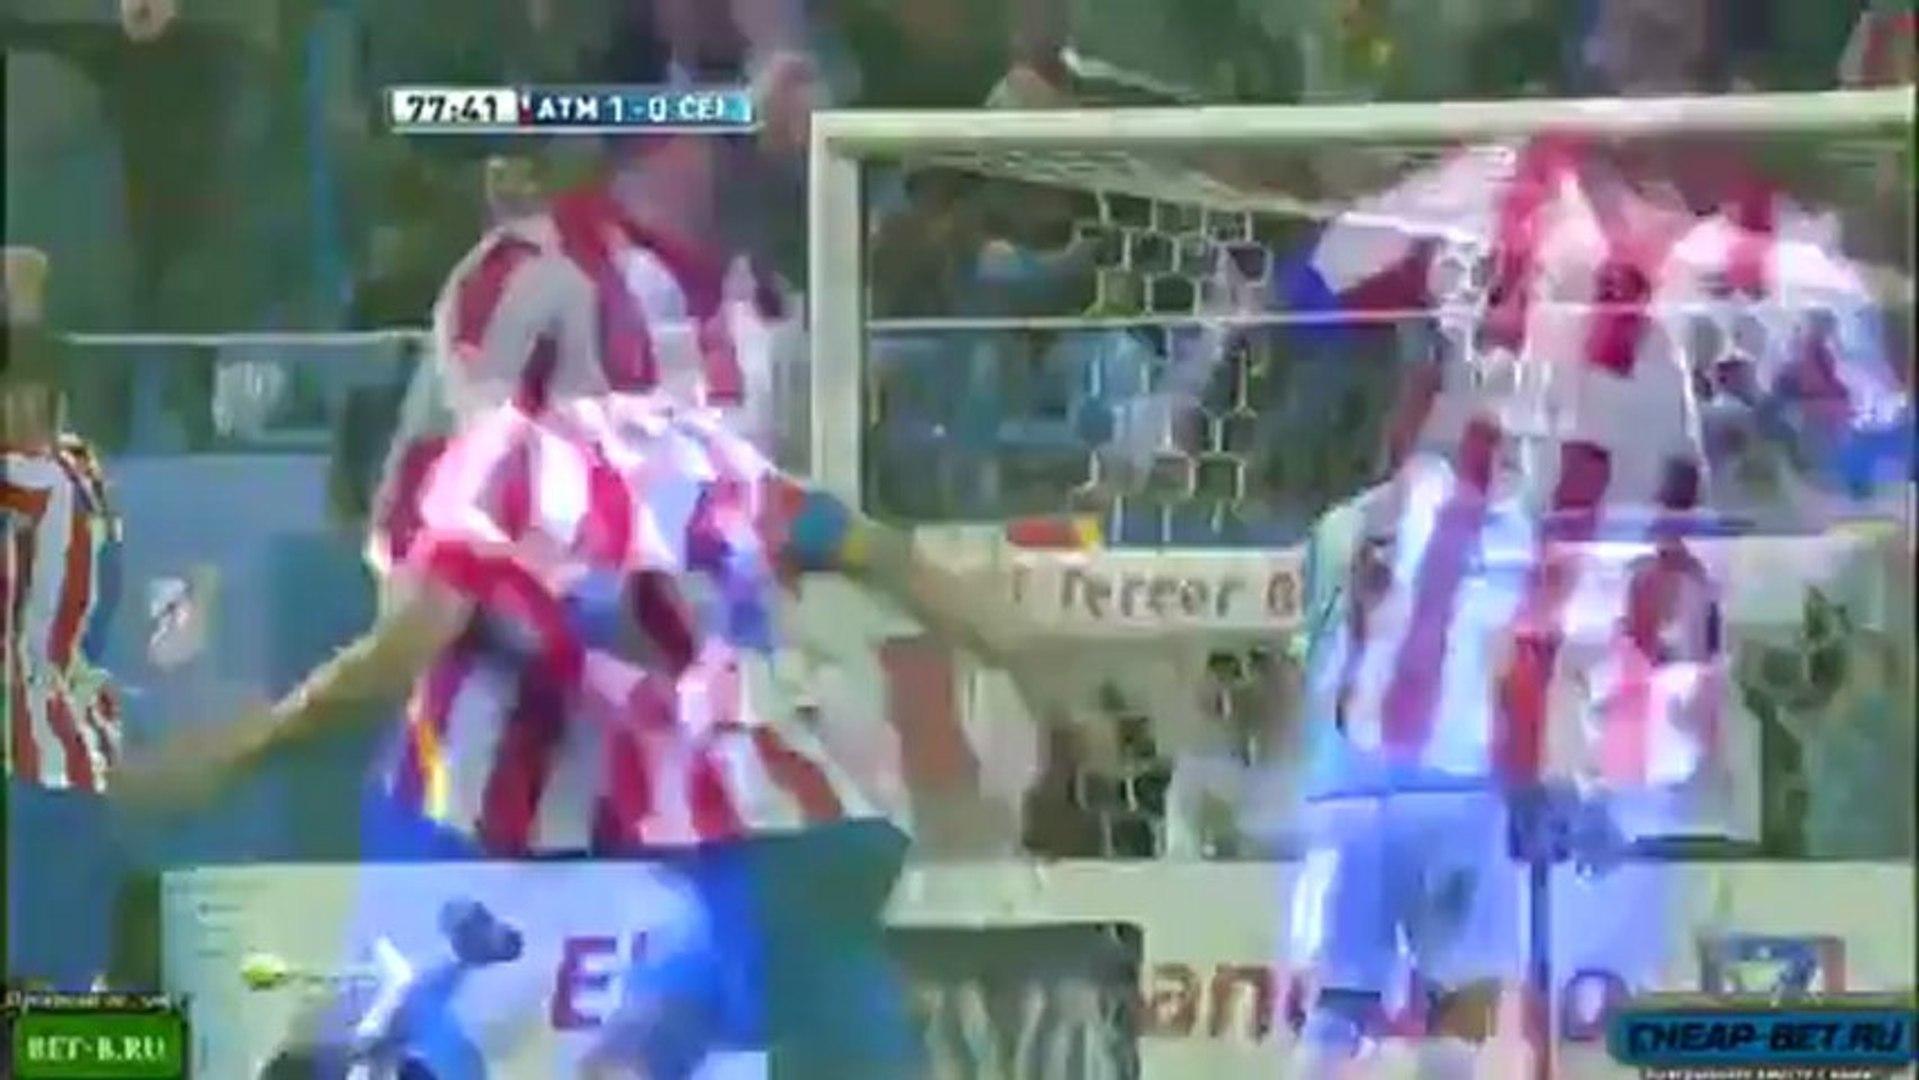 Atletico Madrid 1-0 Celta Vigo Özet - Dailymotion Video